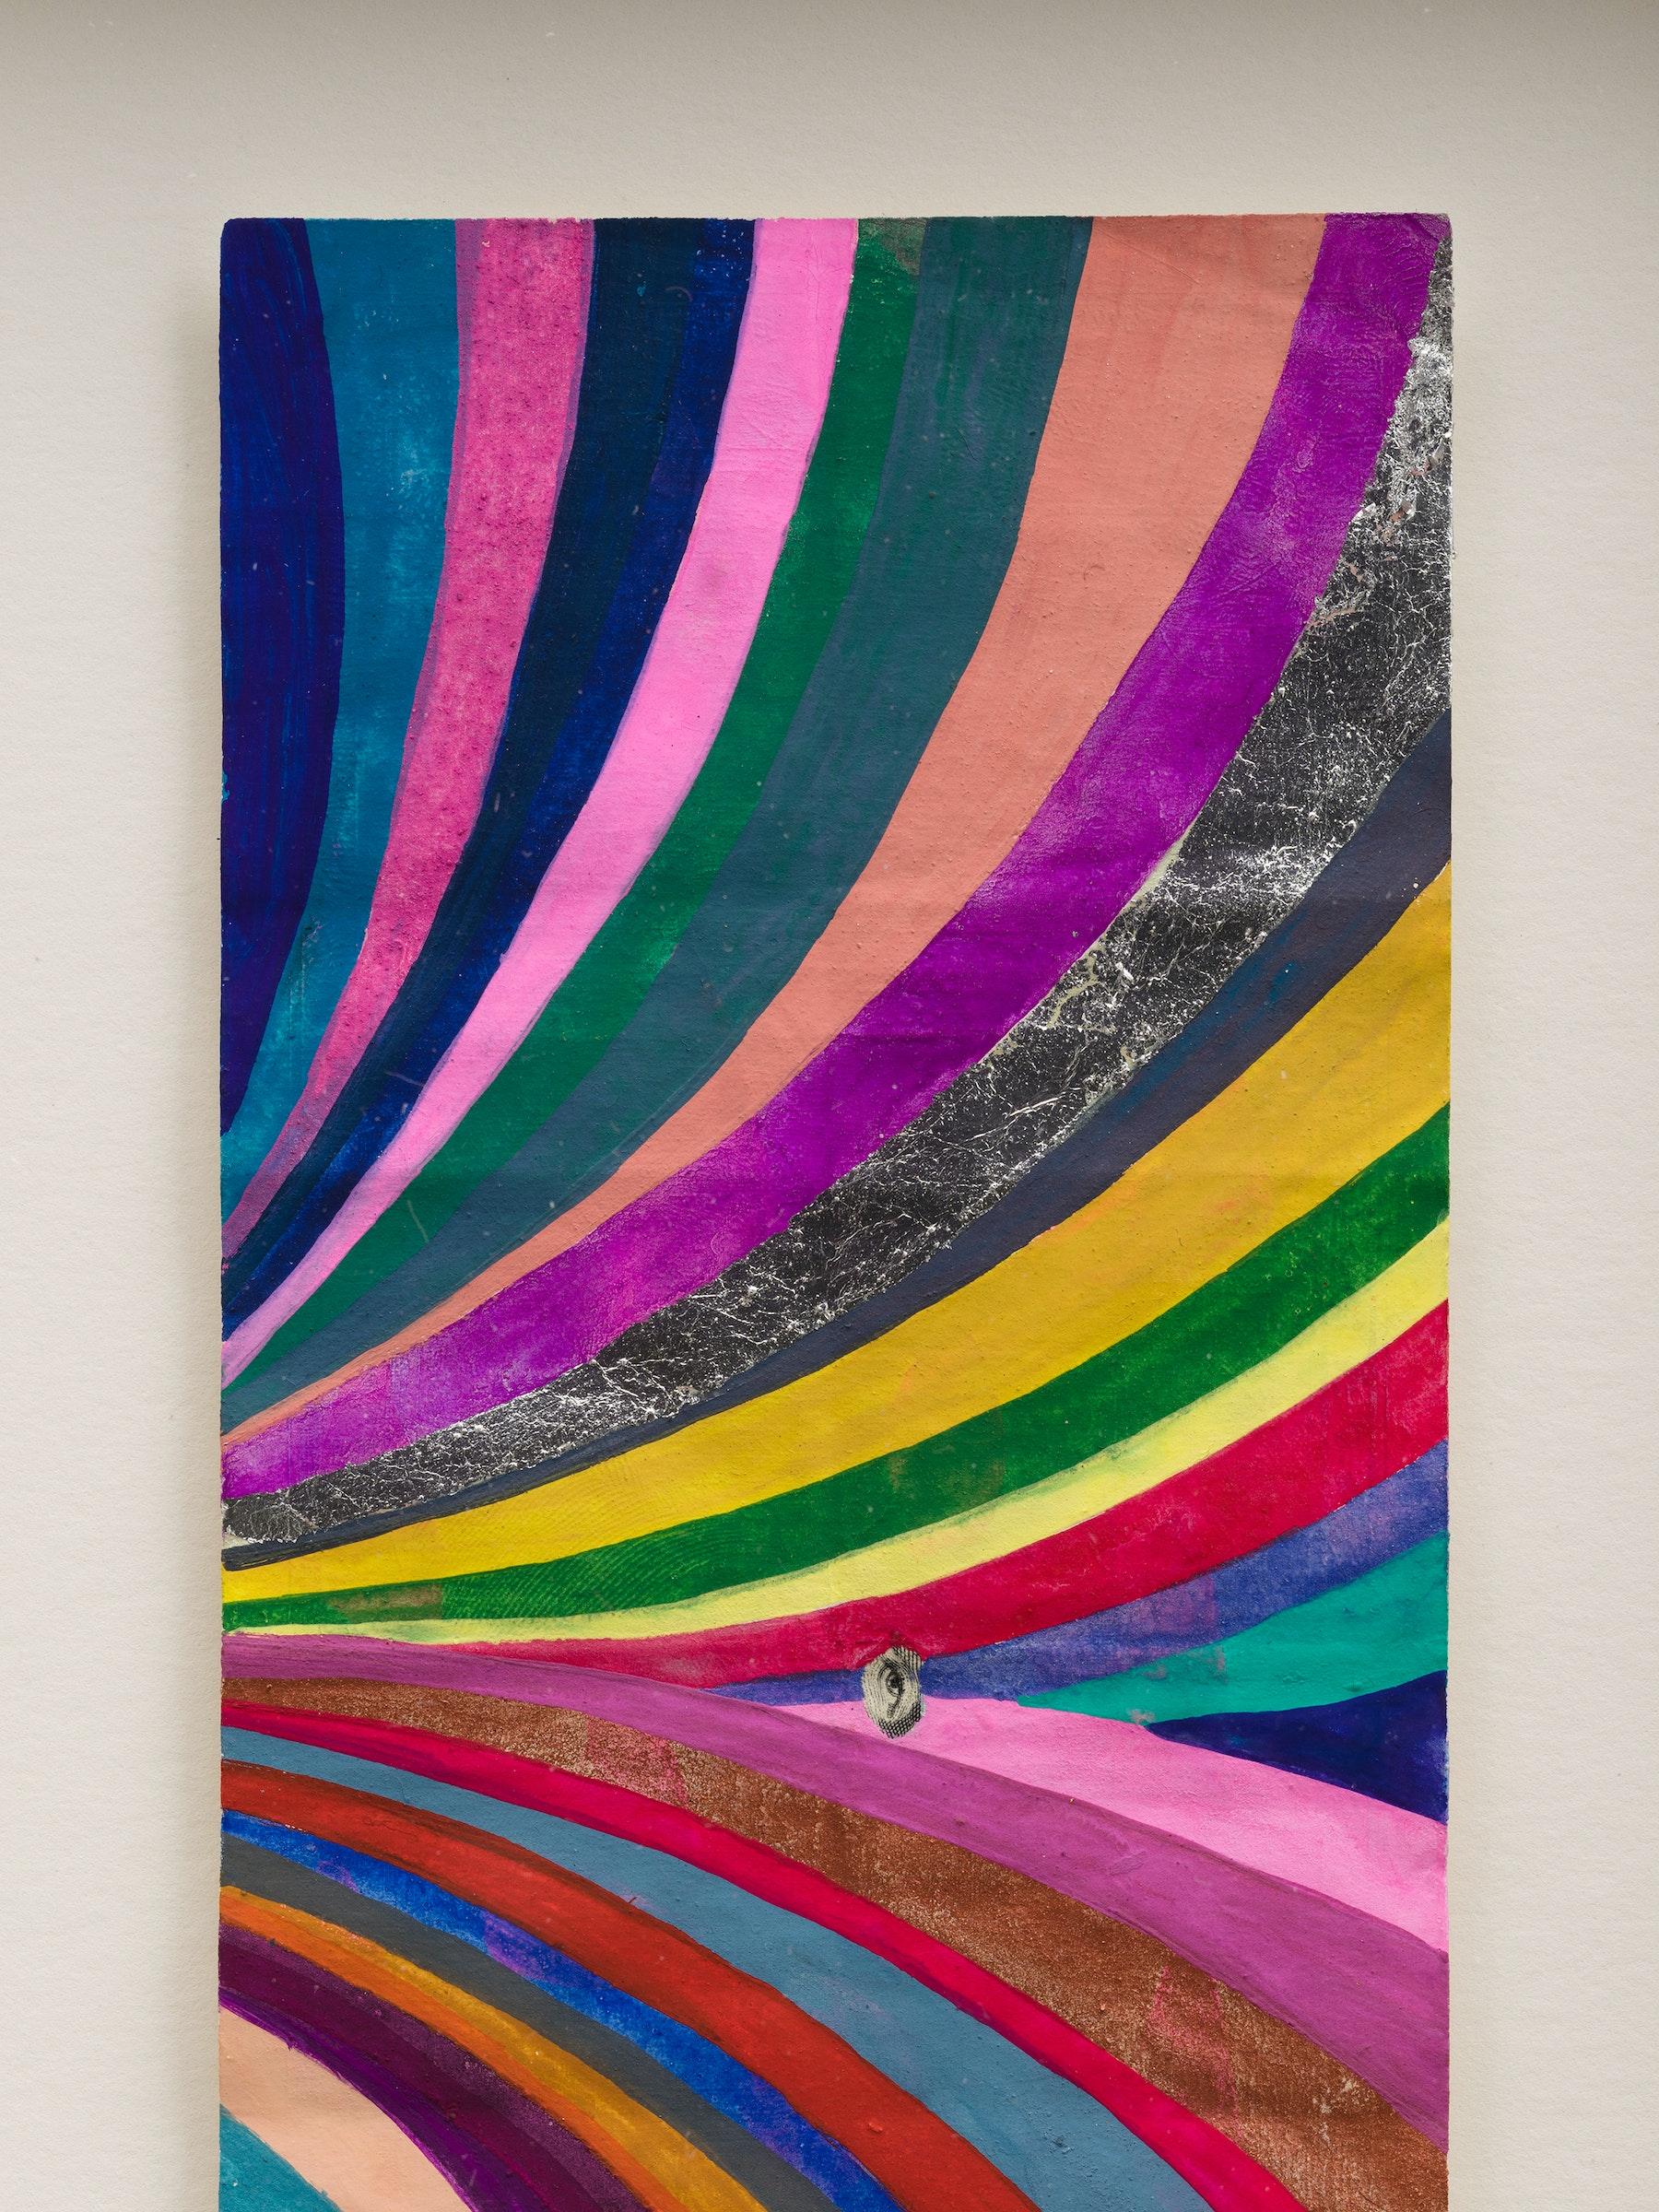 "Sarah Cain ""$ talisman,"" 2021 Acrylic on dollar bill 9 ¹⁄₂"" x 6 ¹⁄₄"" x 1 ³⁄₄"" [HxWxD] (24.13 x 15.85 x 4.45 cm) Inventory #CAS158 Courtesy of the artist and Vielmetter Los Angeles Photo credit: Jeff McLane"